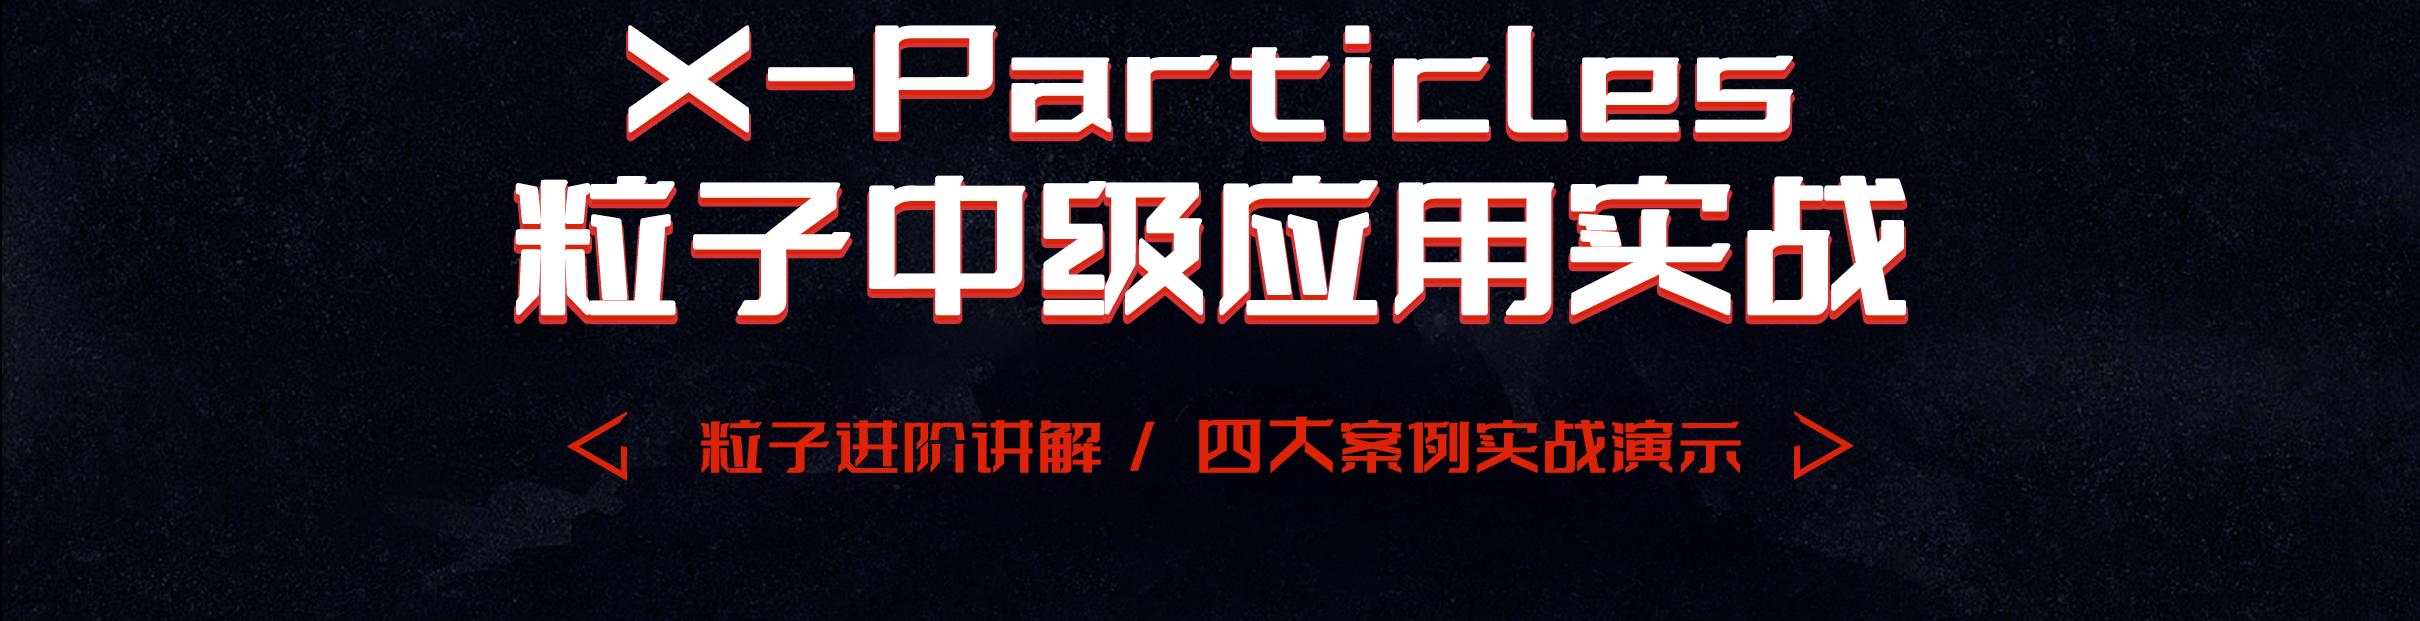 粒子_02.png